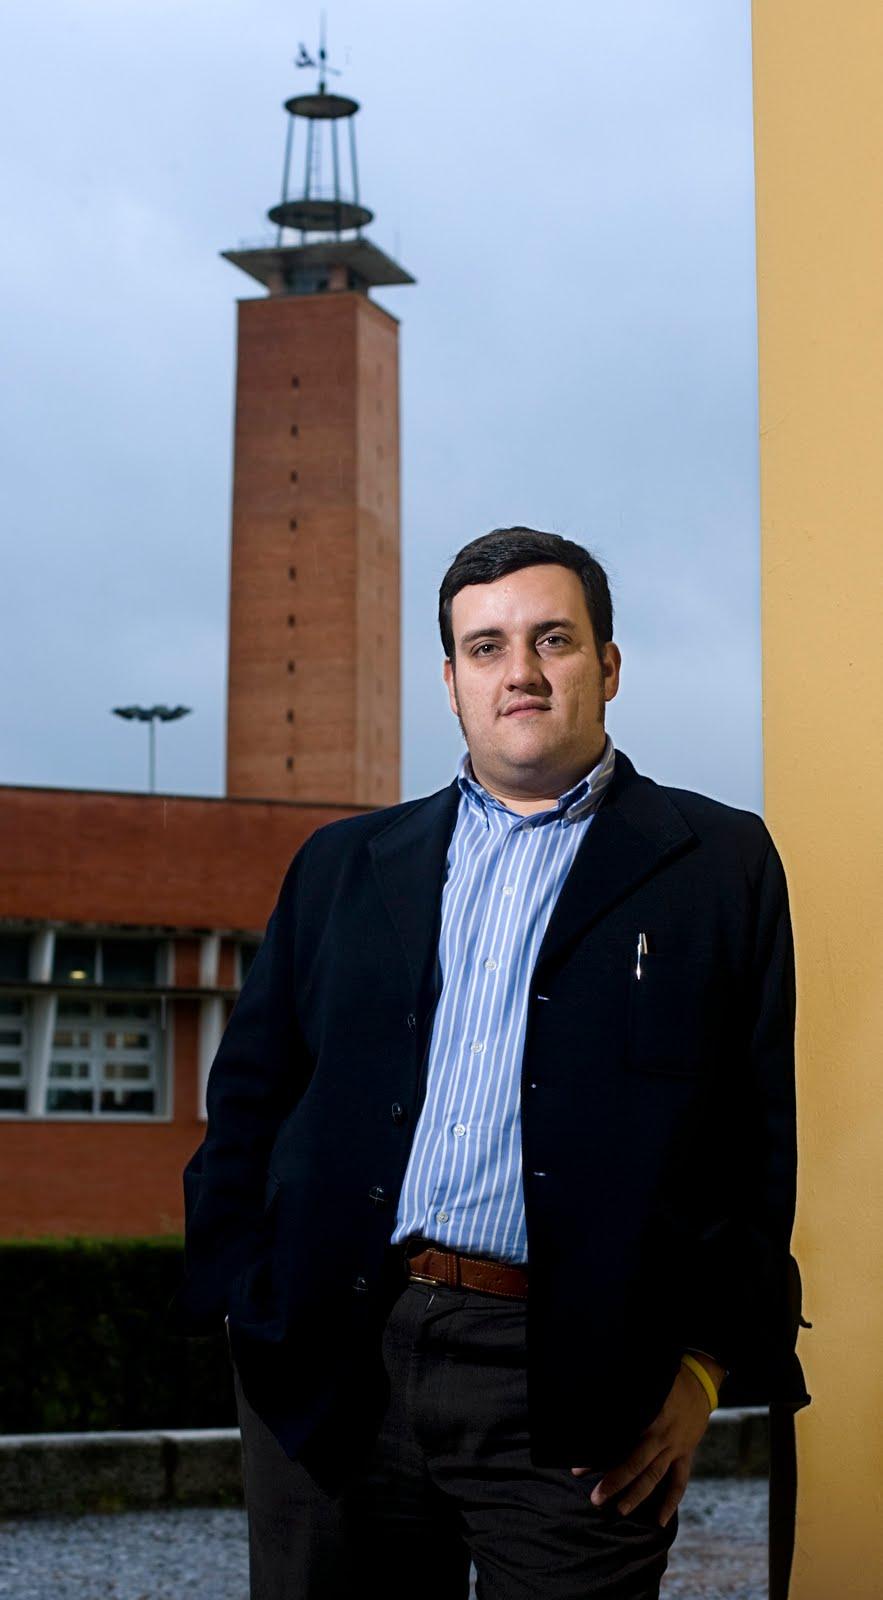 Juan Diego Mata Chacón